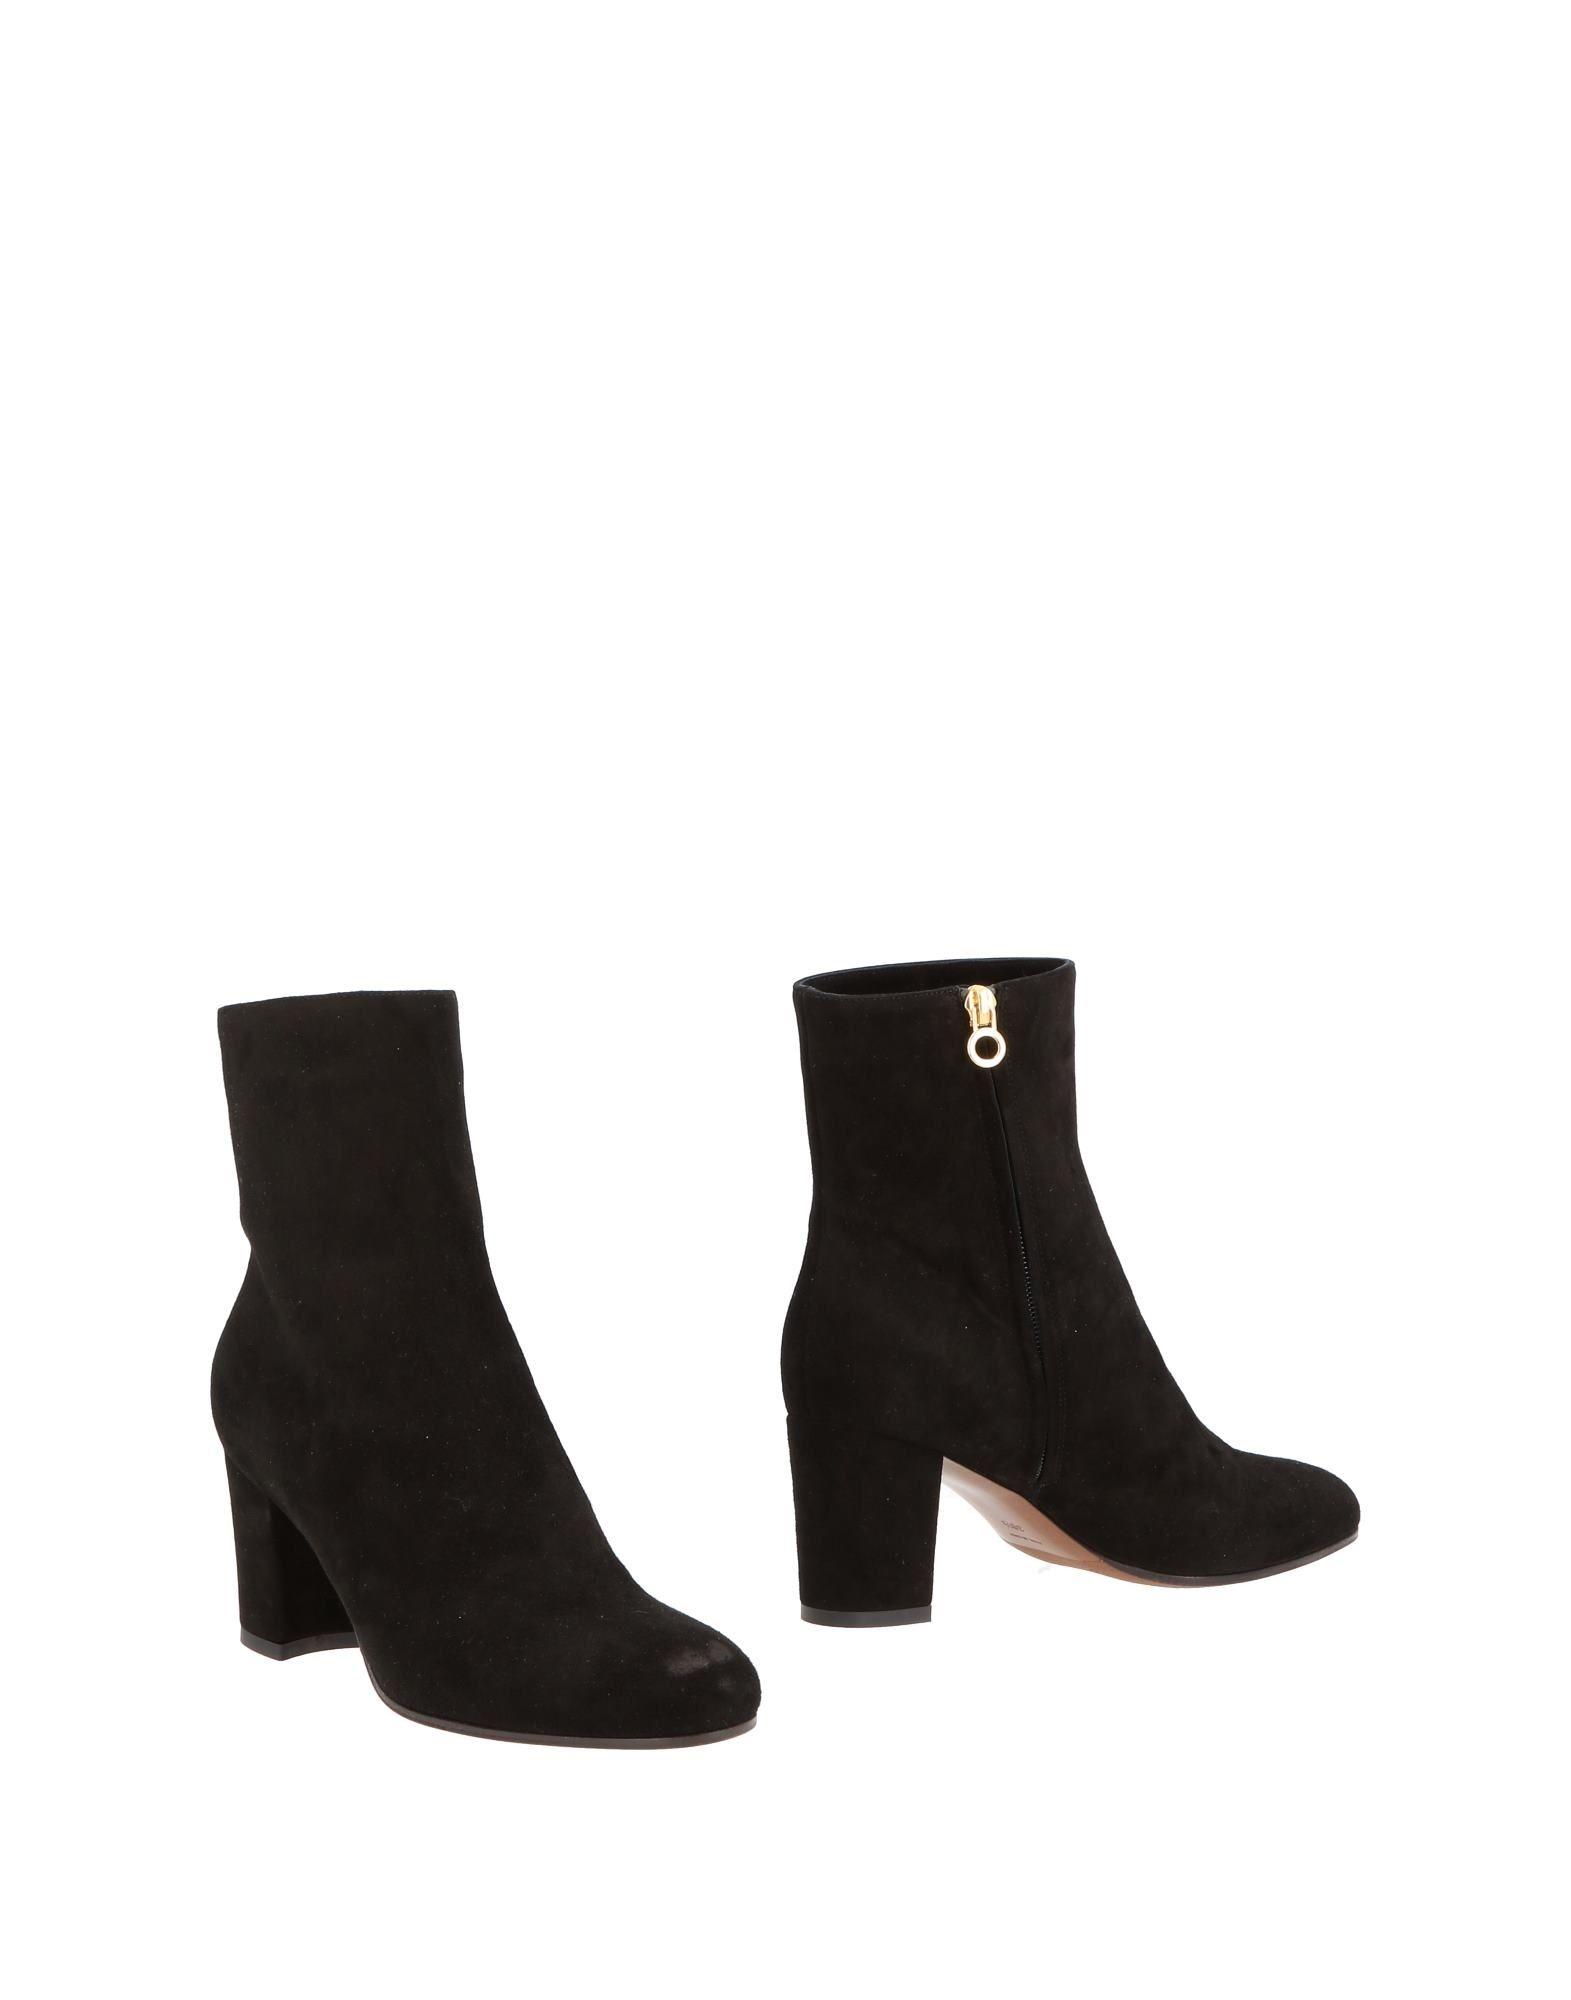 L' Autre Chose Stiefelette Damen  11252044OQGut aussehende strapazierfähige Schuhe